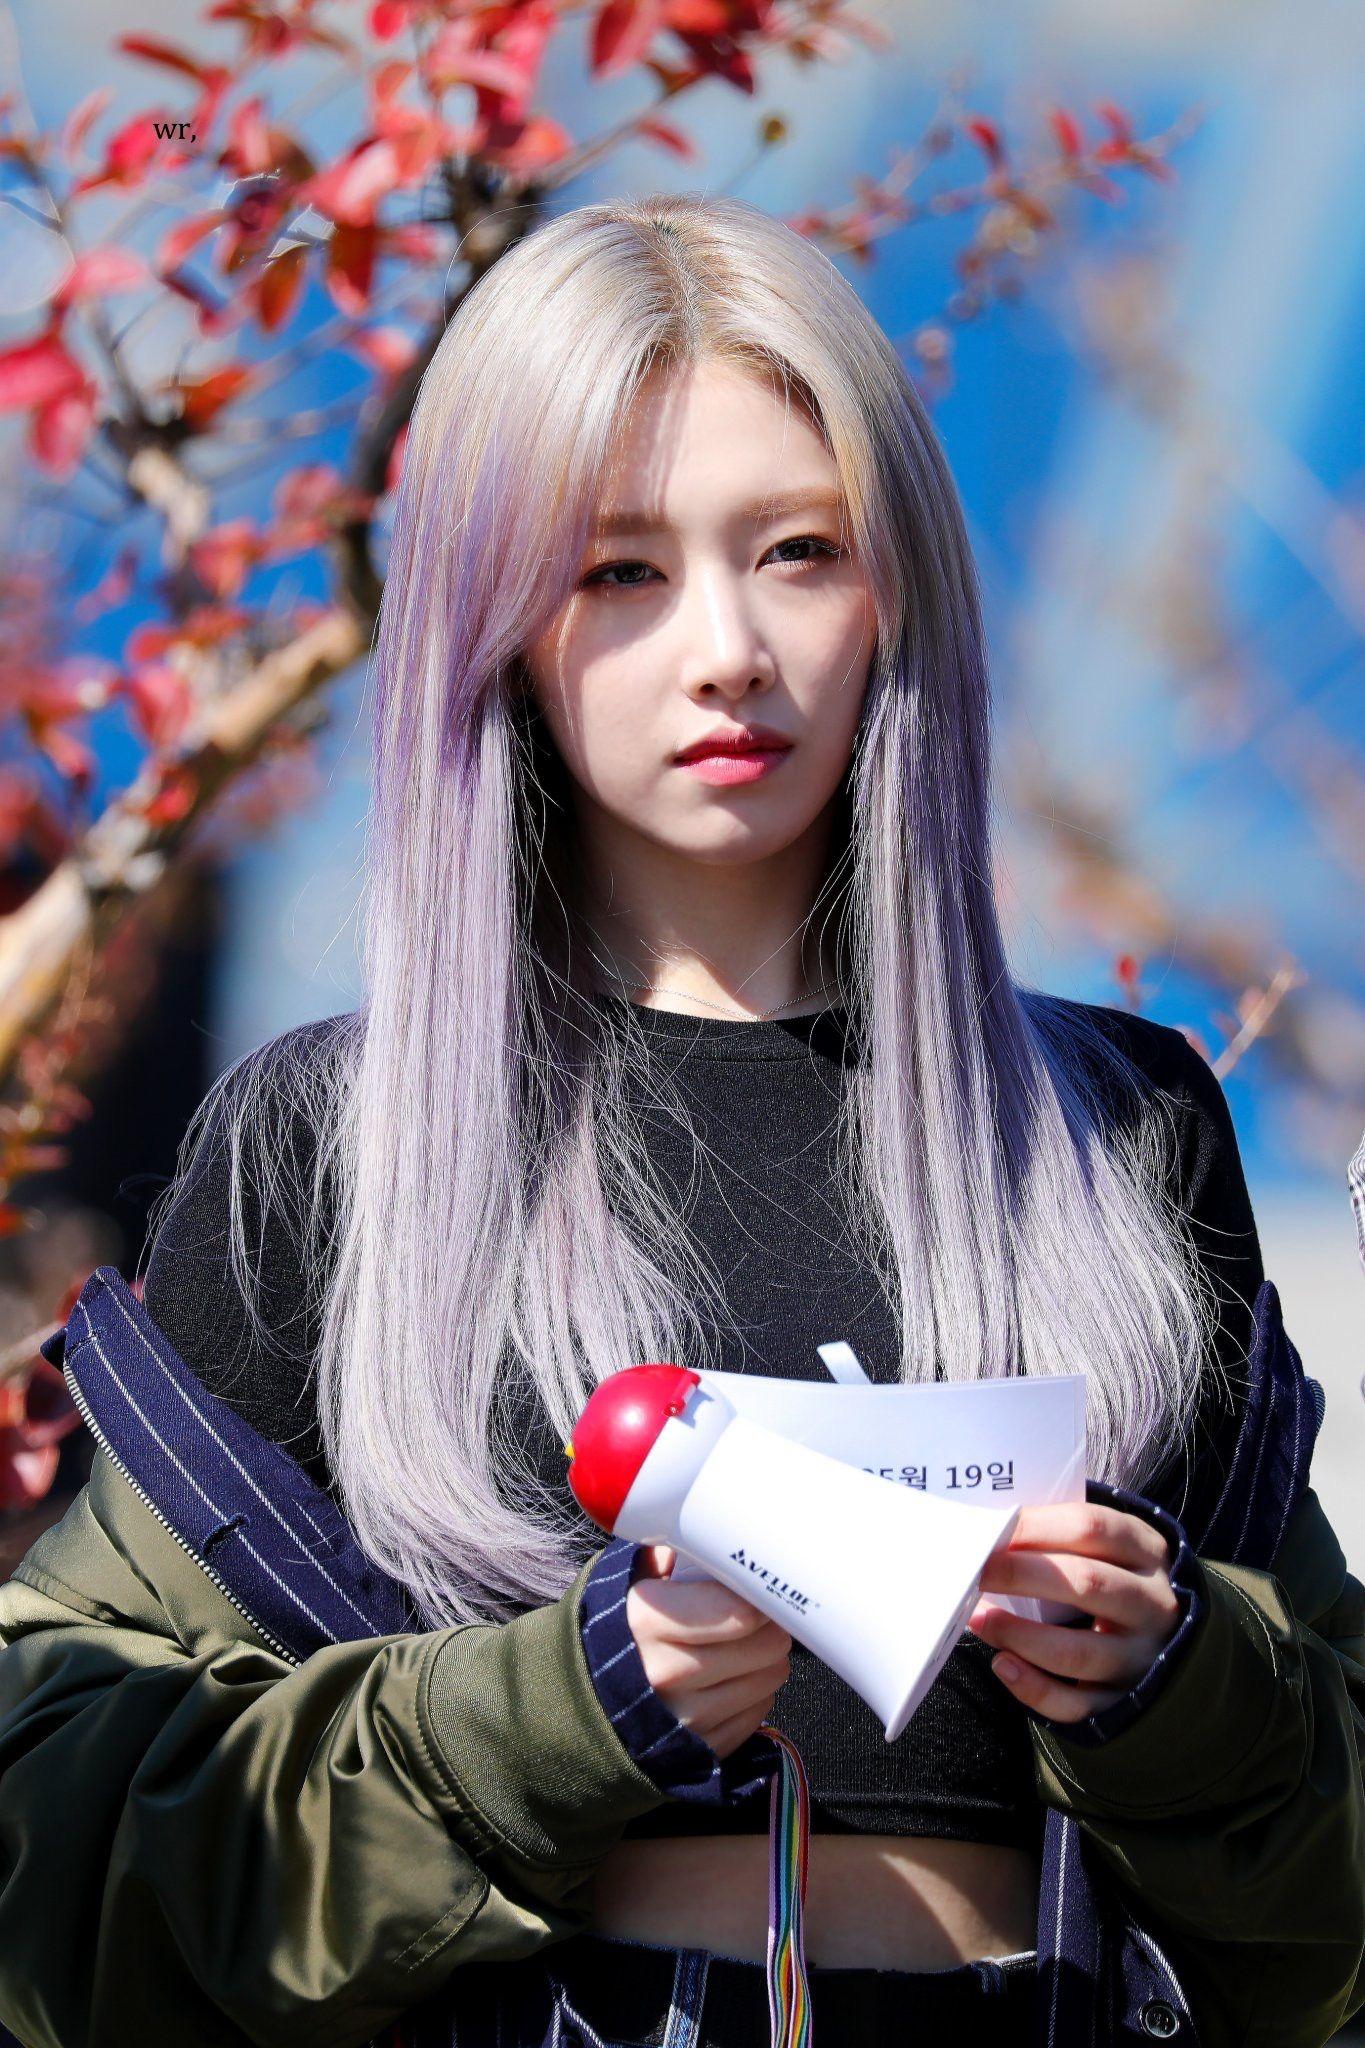 Pin By Honeyhuihyeon On Euijin Kpop Hair Kpop Girl Groups Kpop Girls